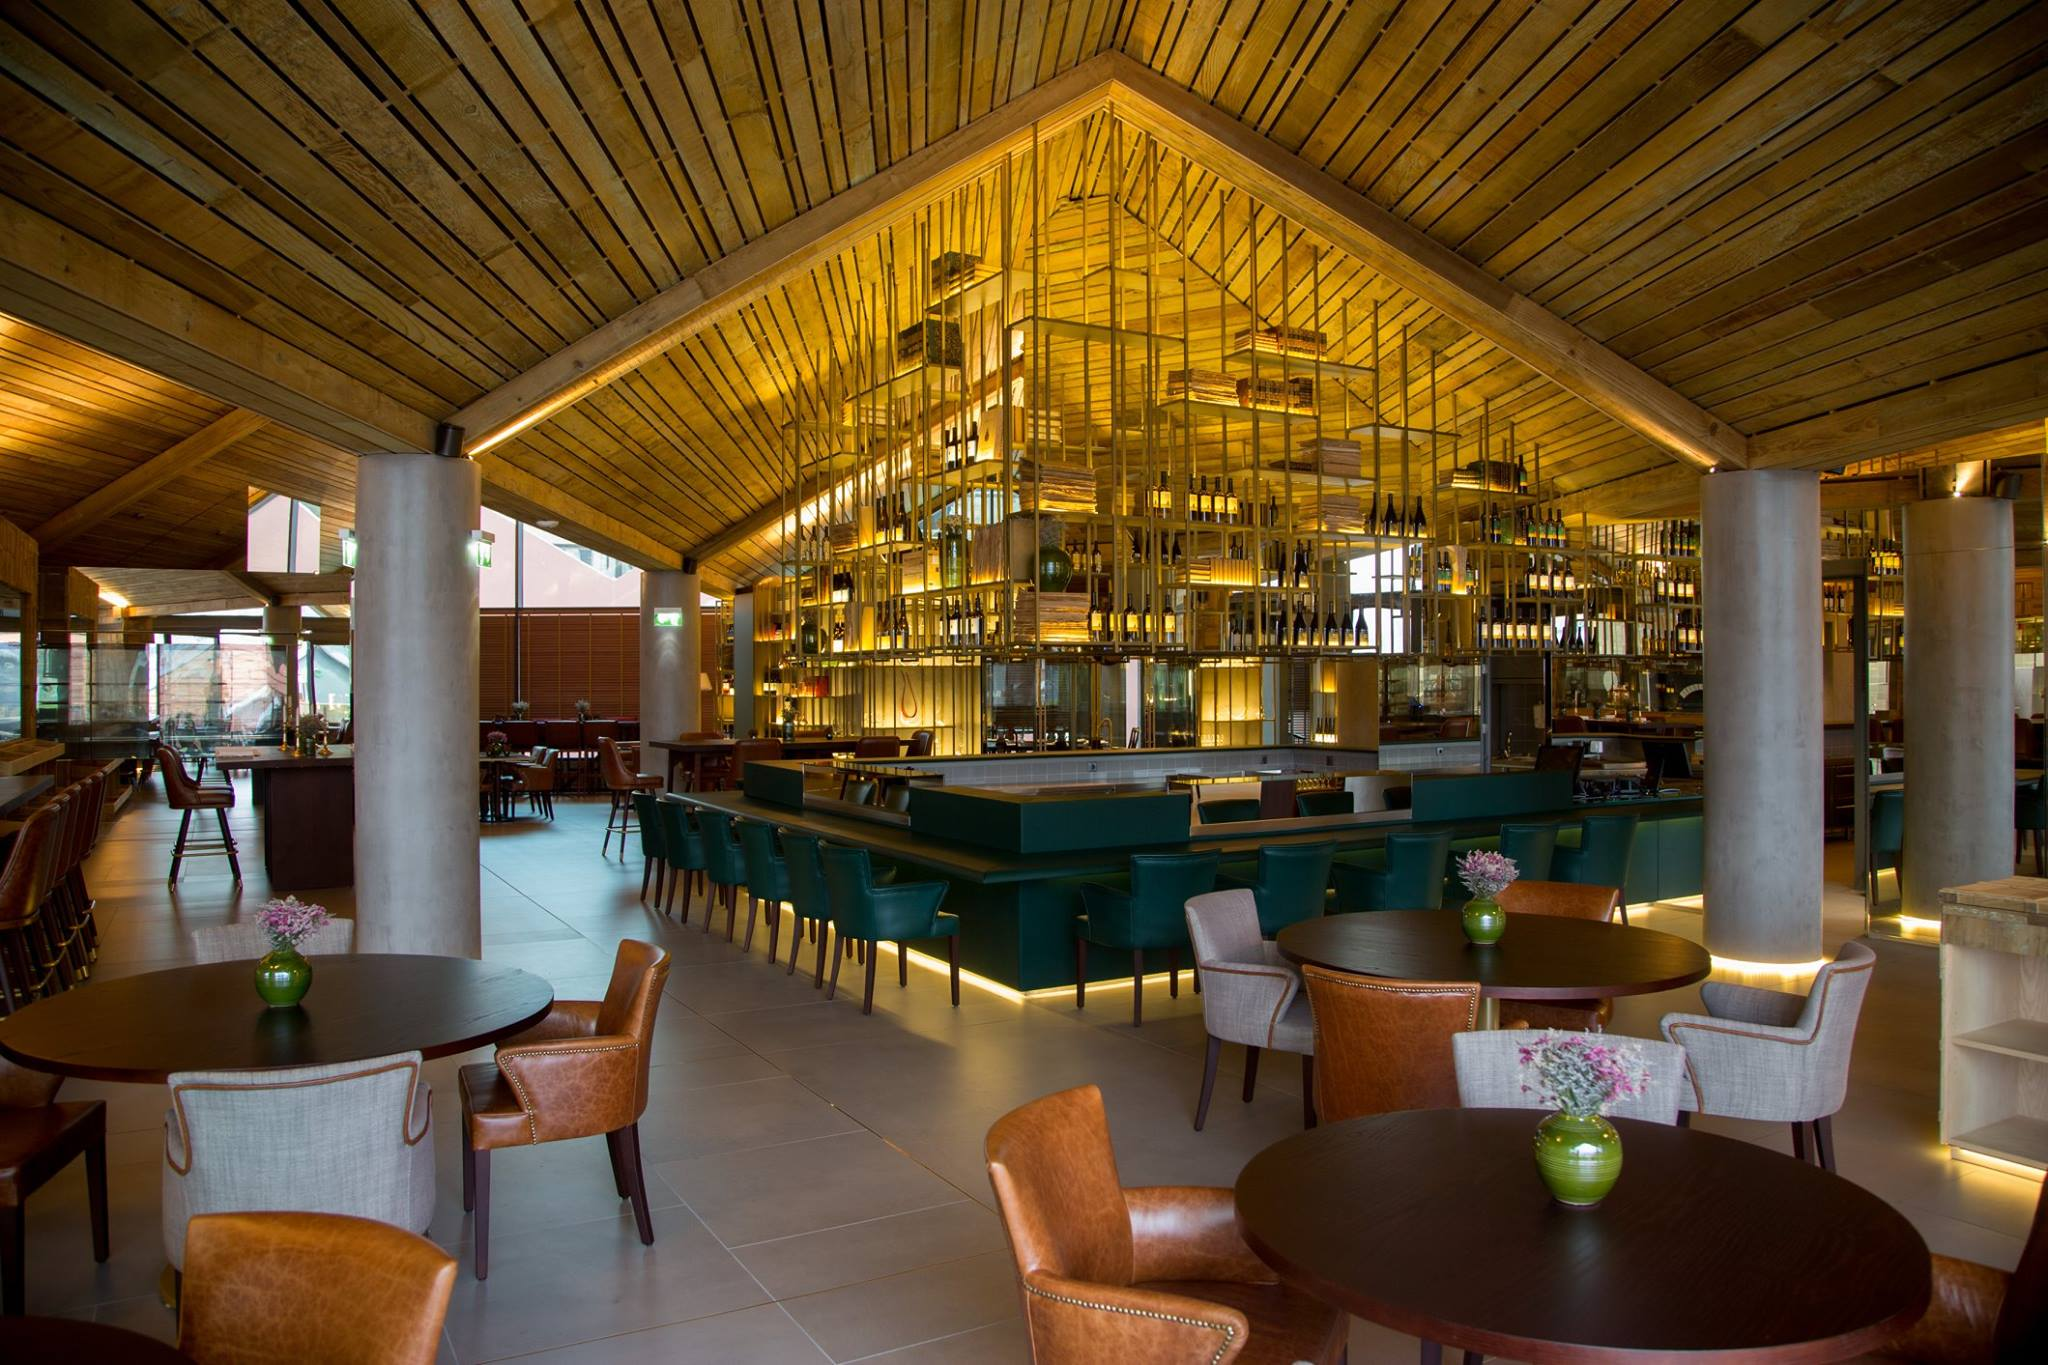 Salle du restaurant Enoteca 17.56 - Musee Real Companhia Veha - Vila Nova de Gaia - Porto